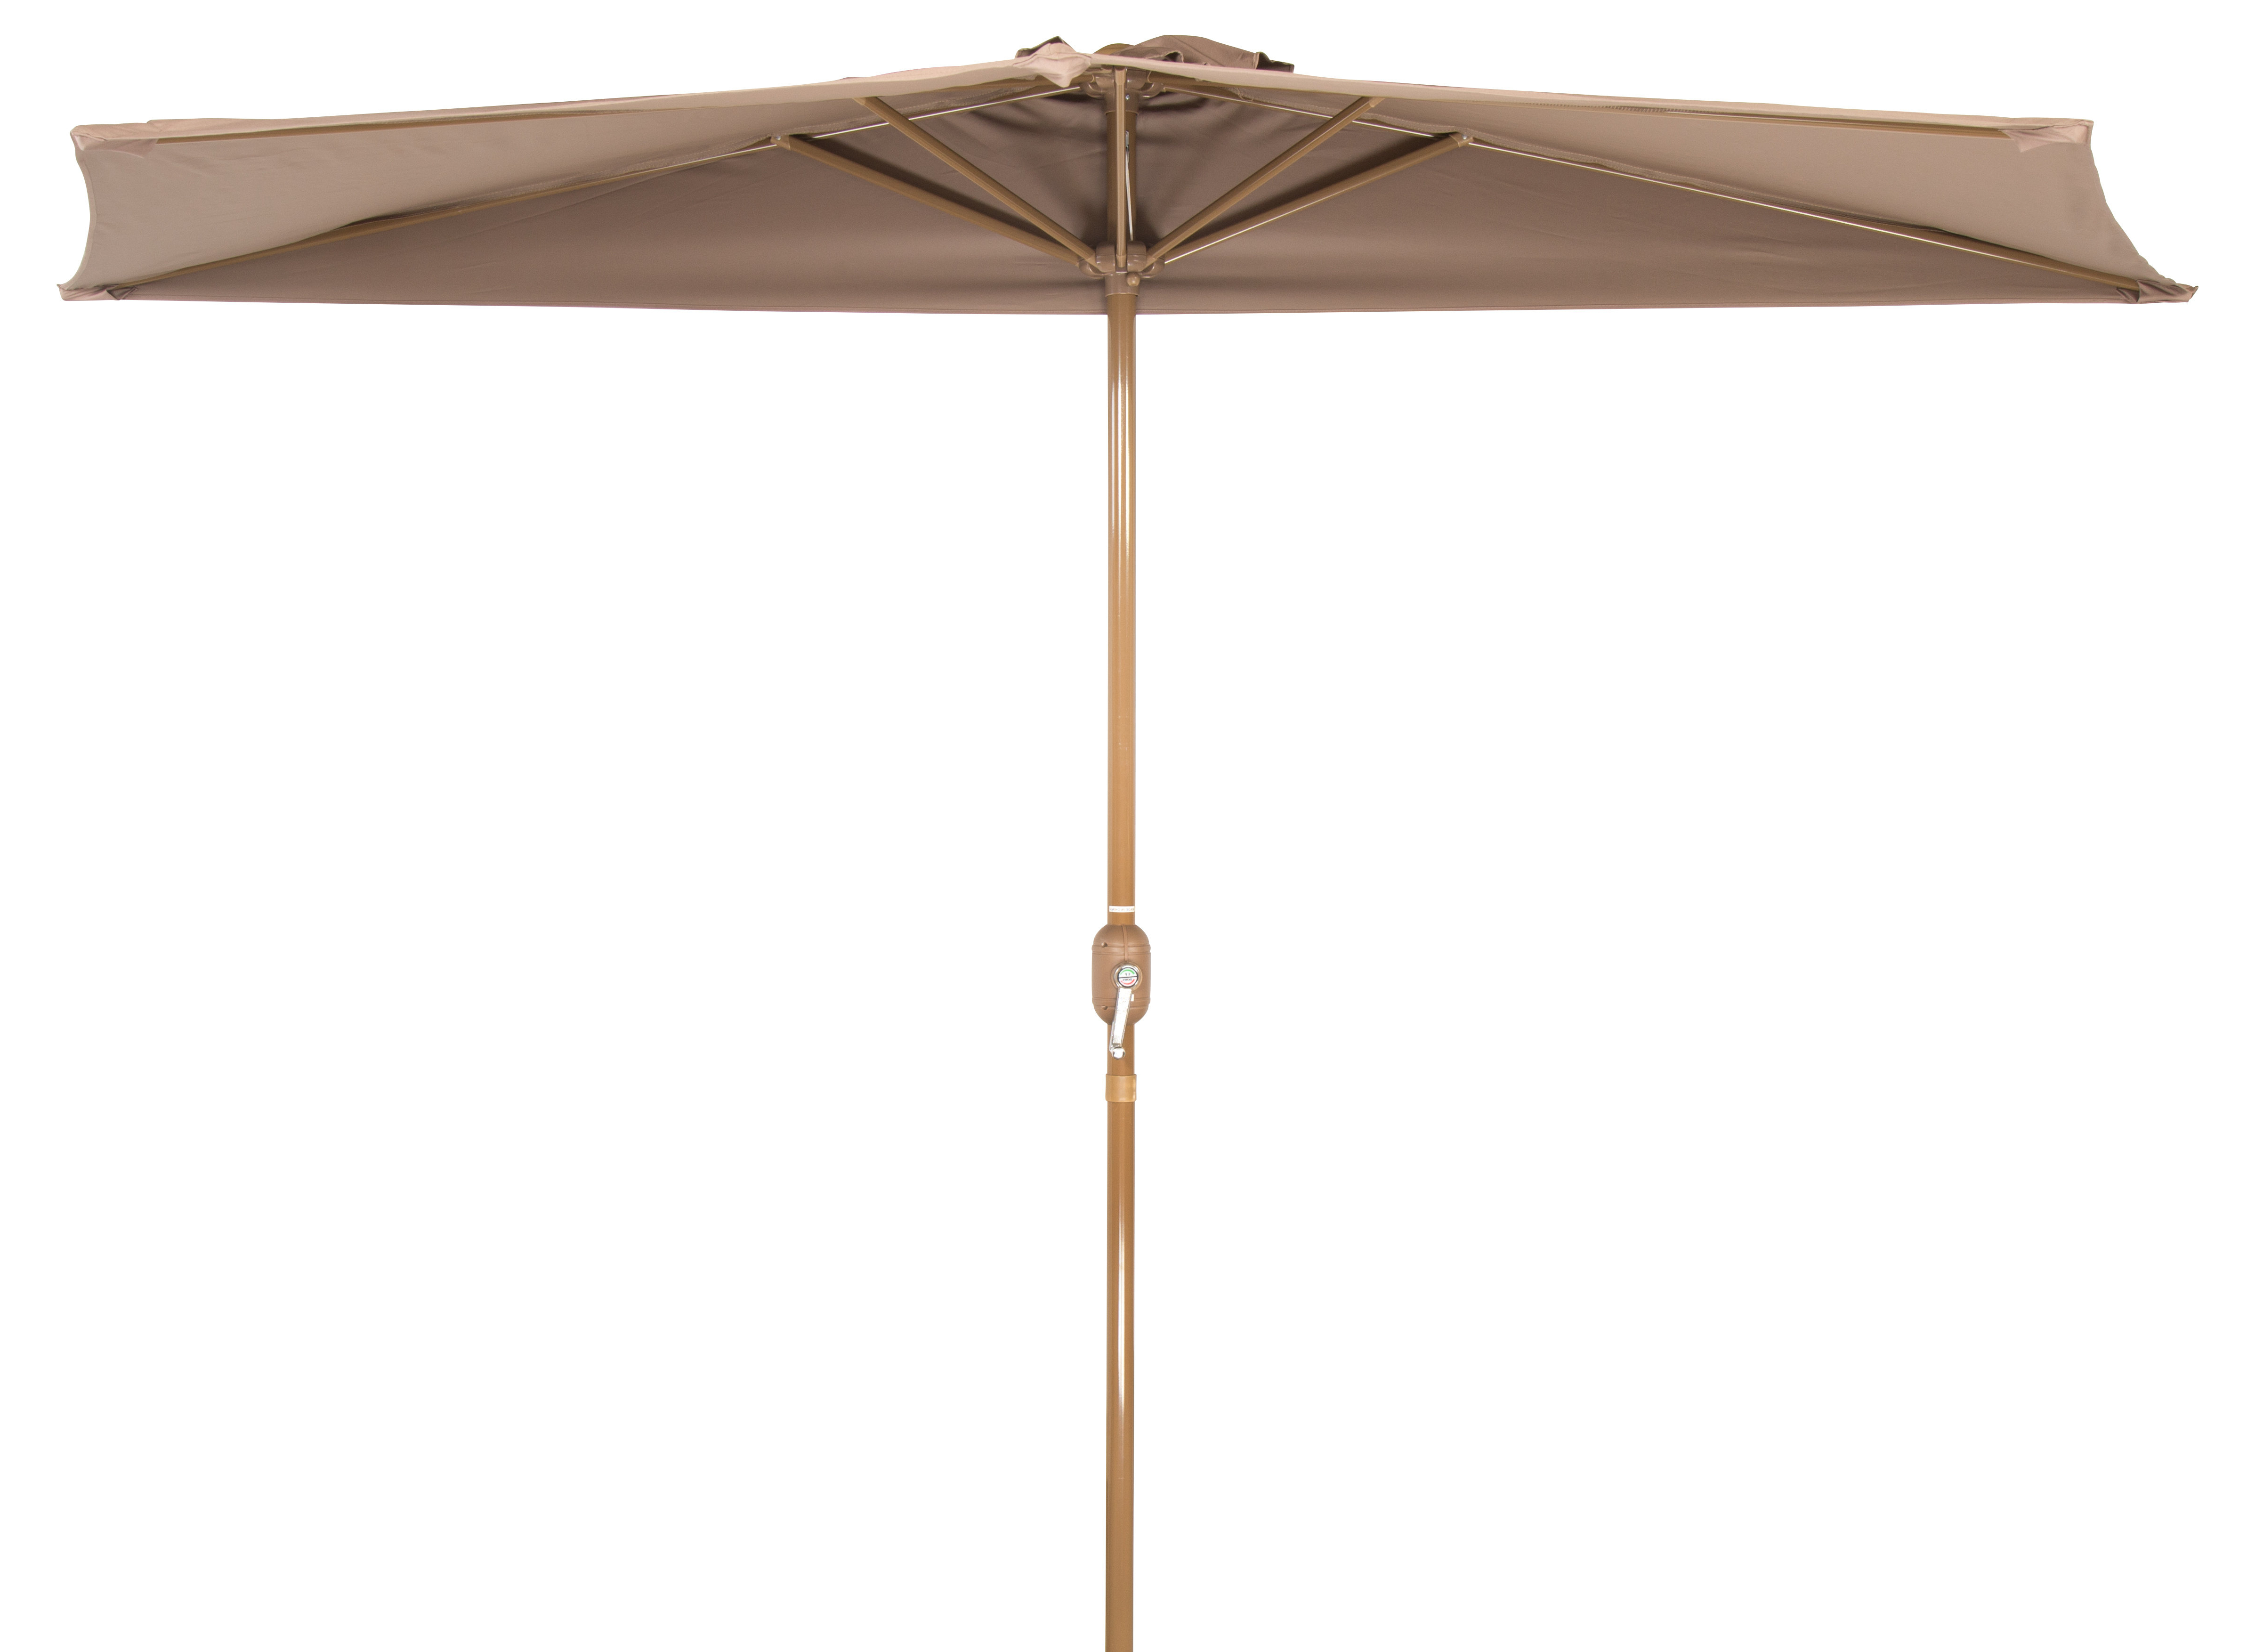 Bricker Market Umbrellas In 2020 Hwang Patio Half 4.5' X 9' Rectangular Market Umbrella (Gallery 4 of 20)